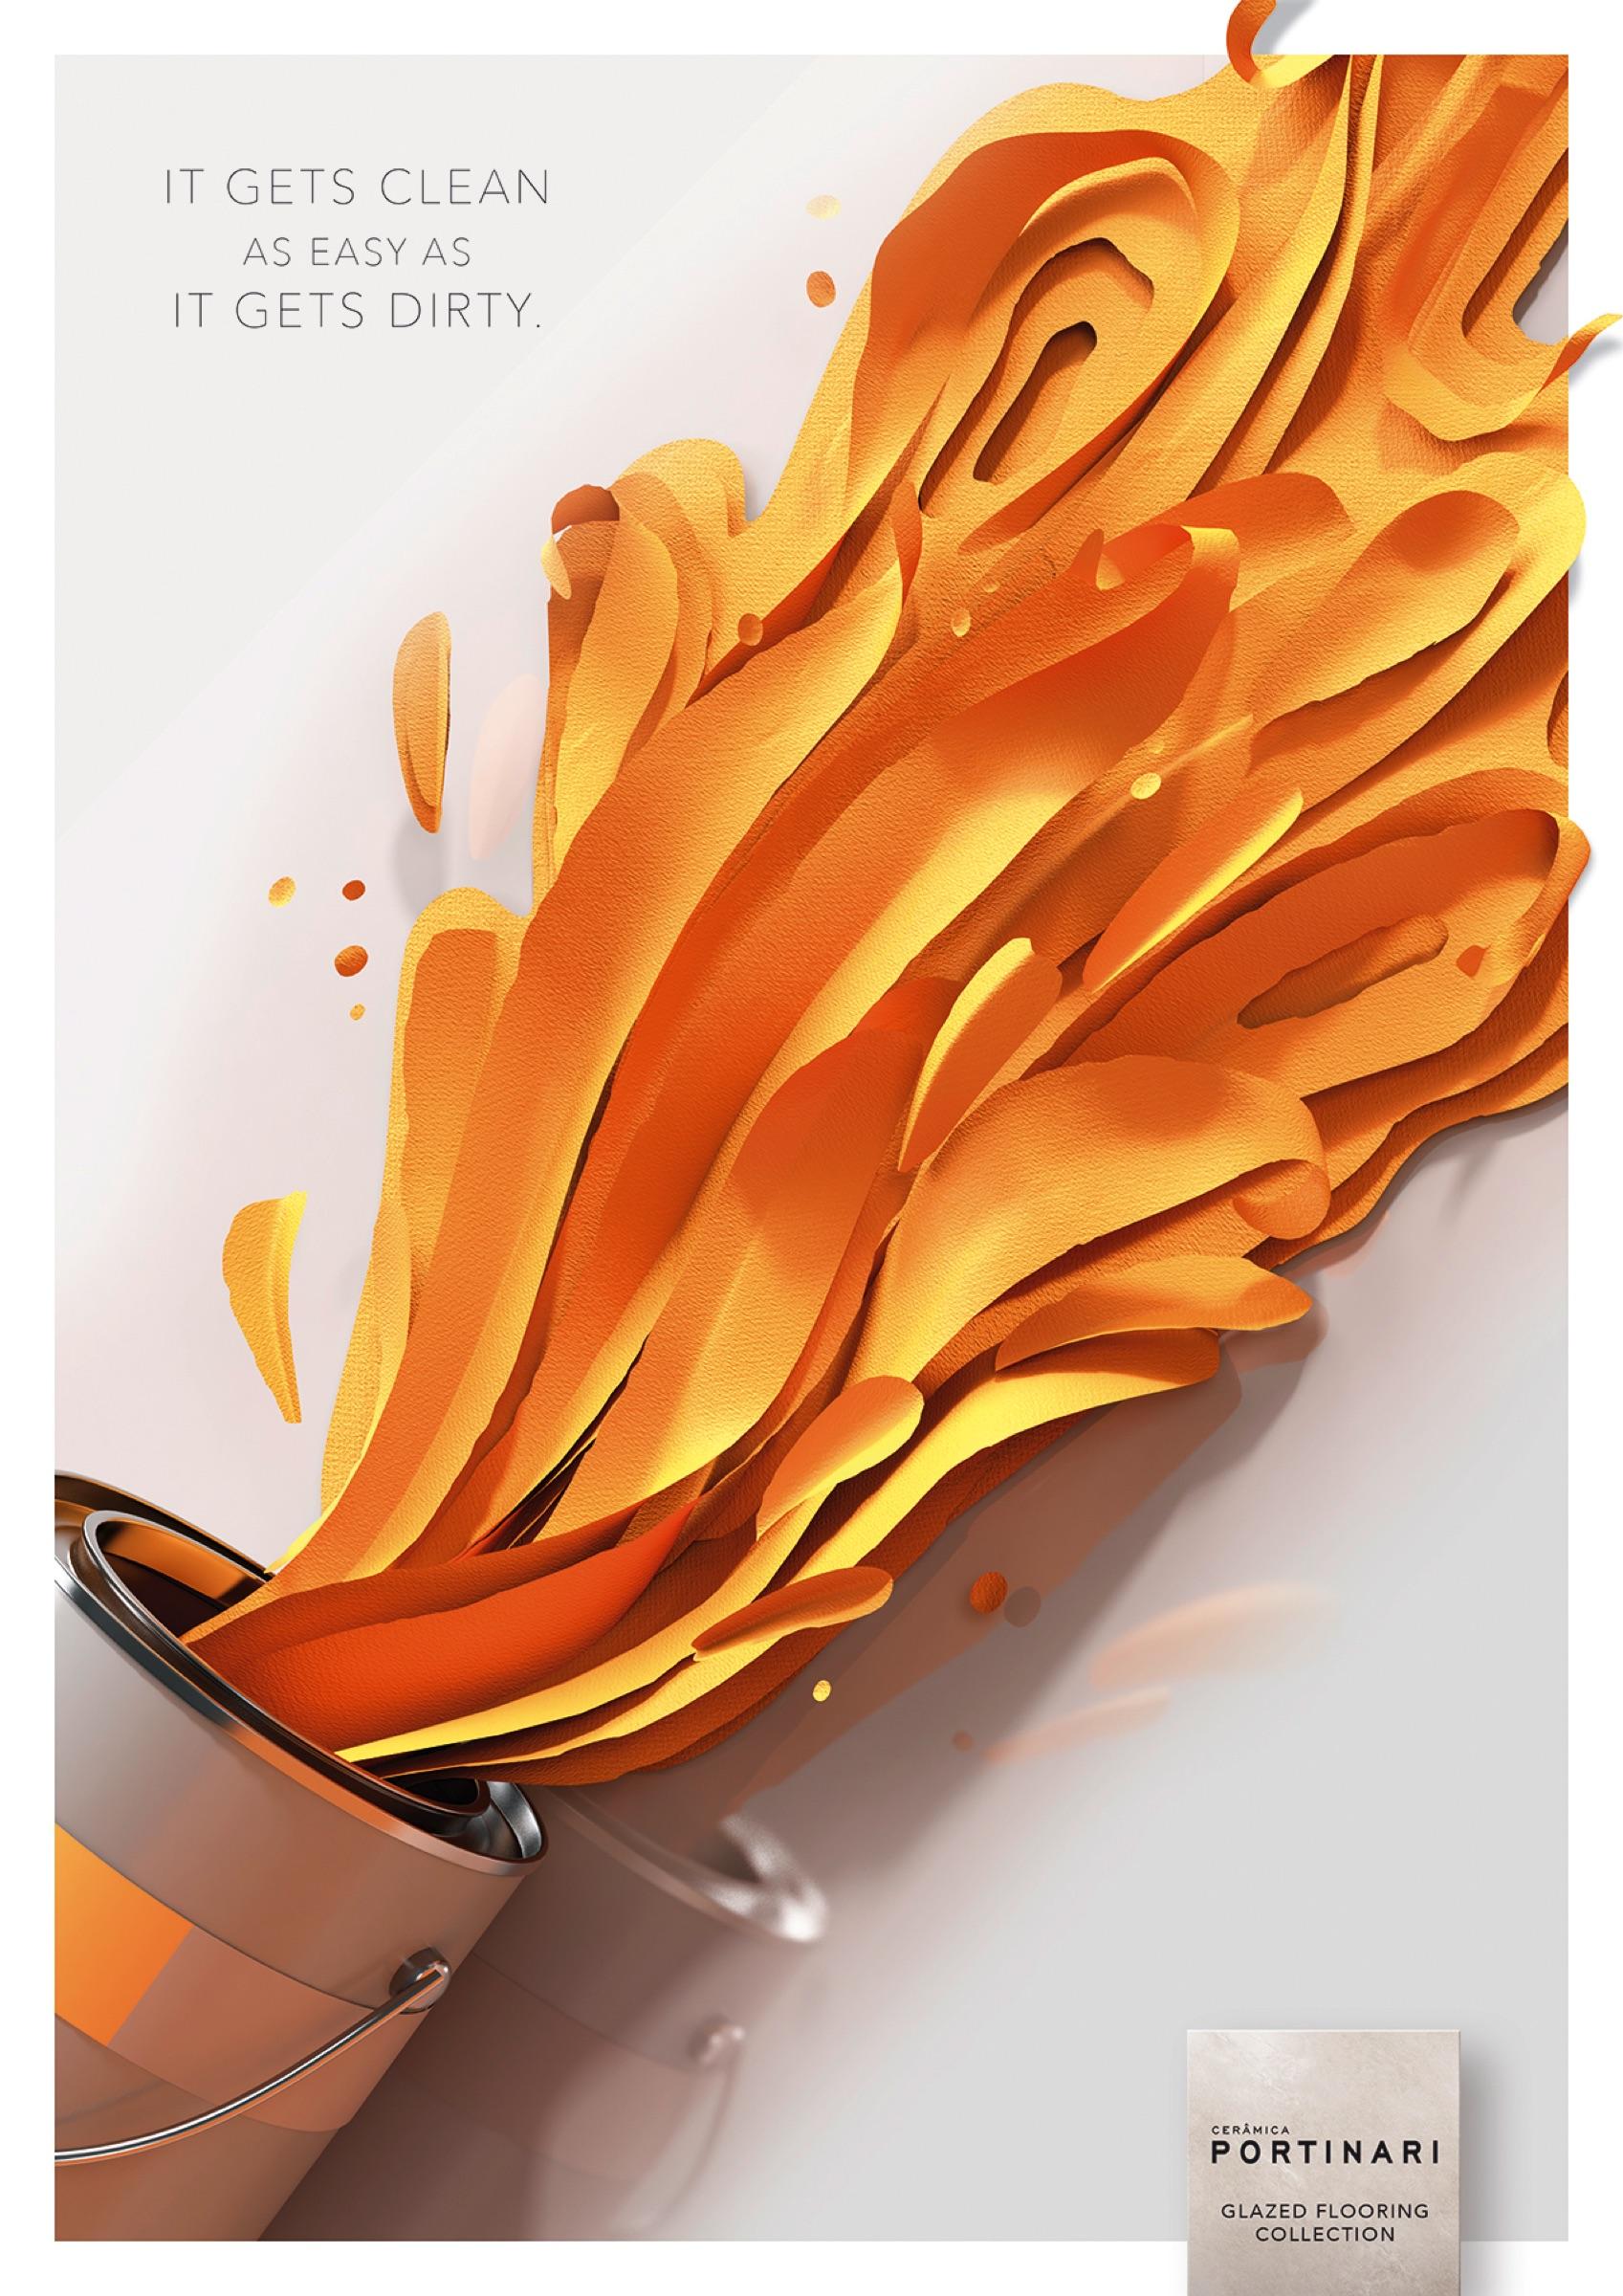 Ceramica Portinari Print Advert By Brainbox: Paint stain ...